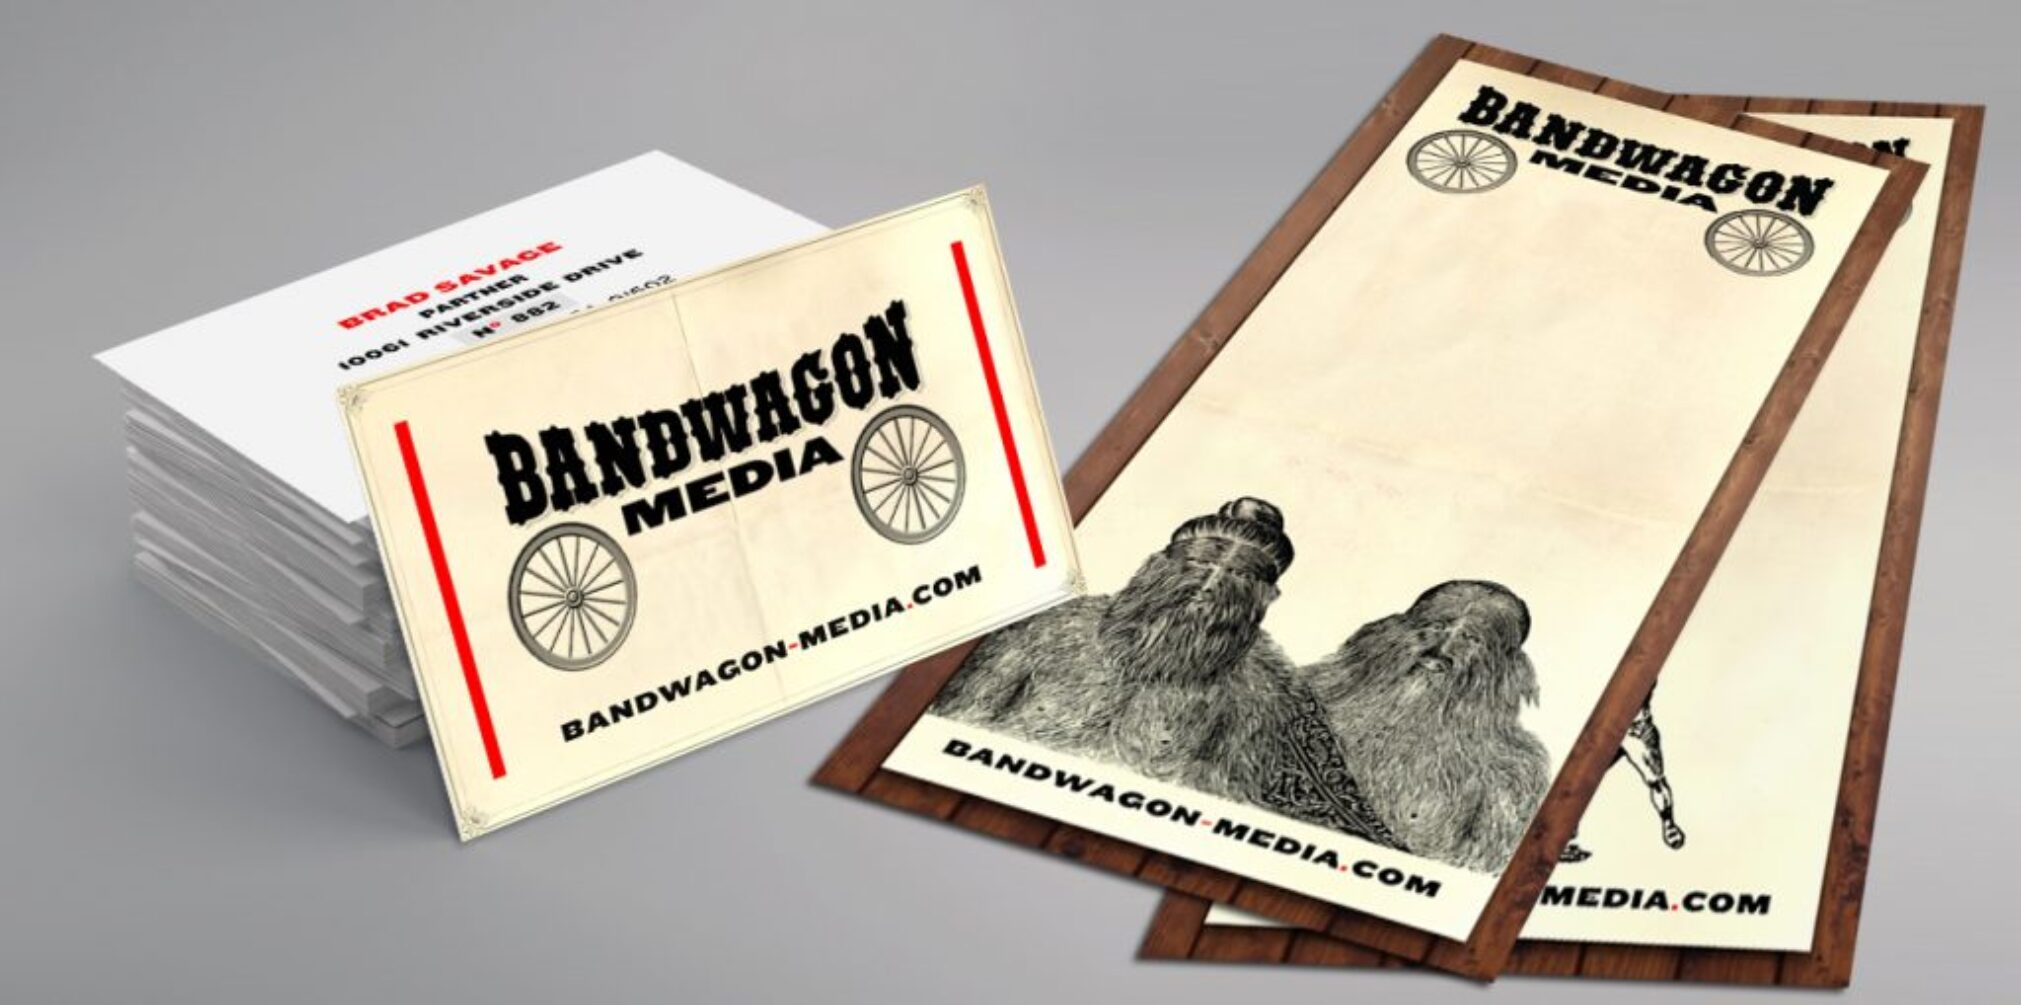 Bandwagon Media : Brand strategy, Logo and Identity Development by Day For Night.